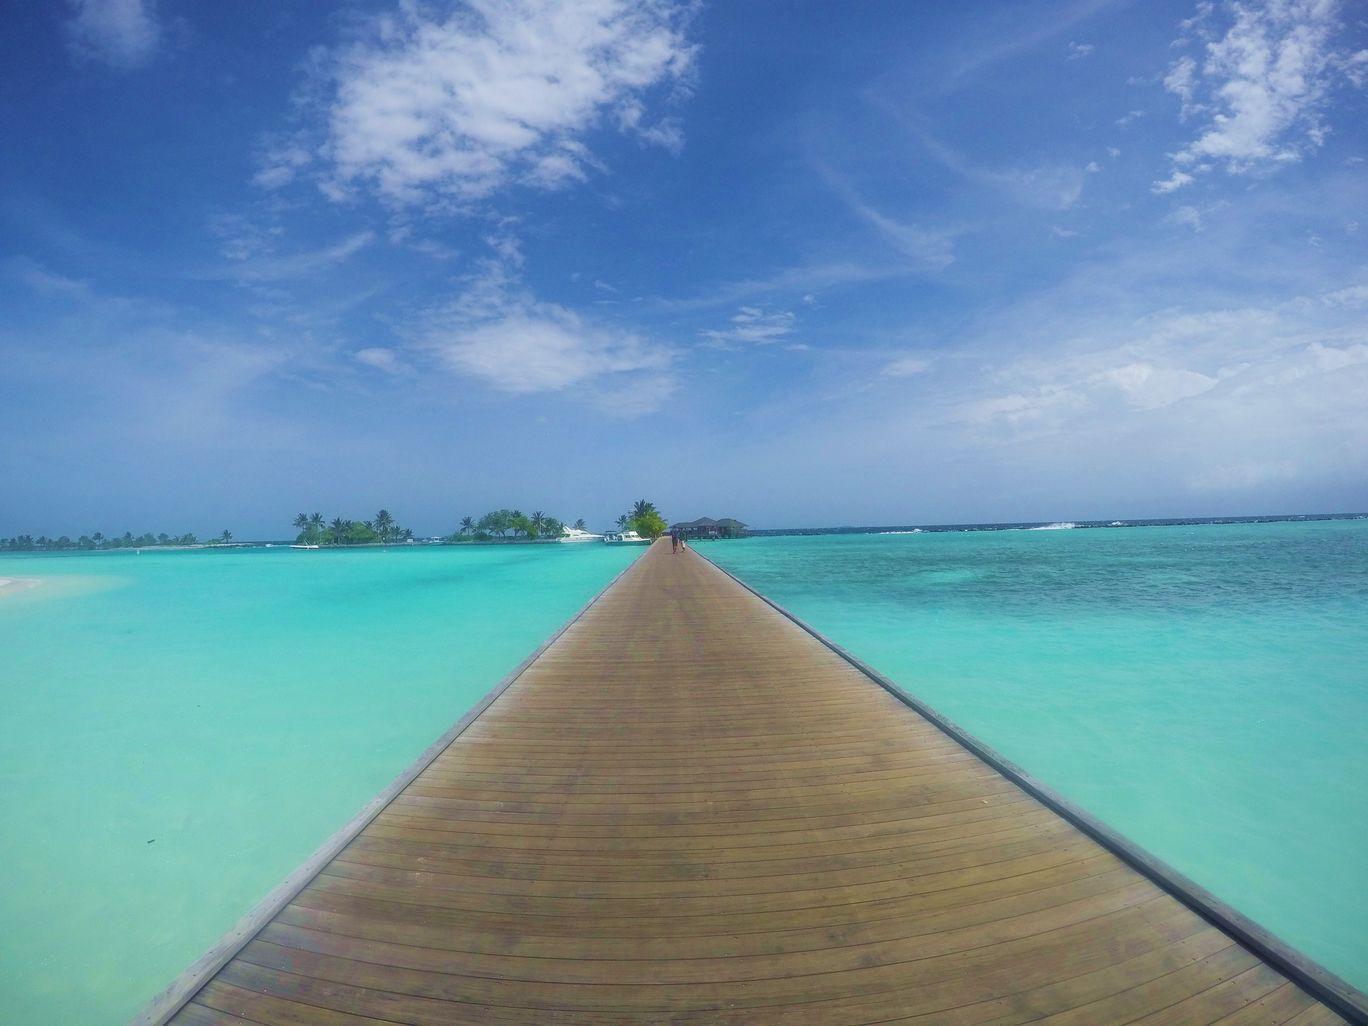 Photo of Maldives By Khushboo Bhambri